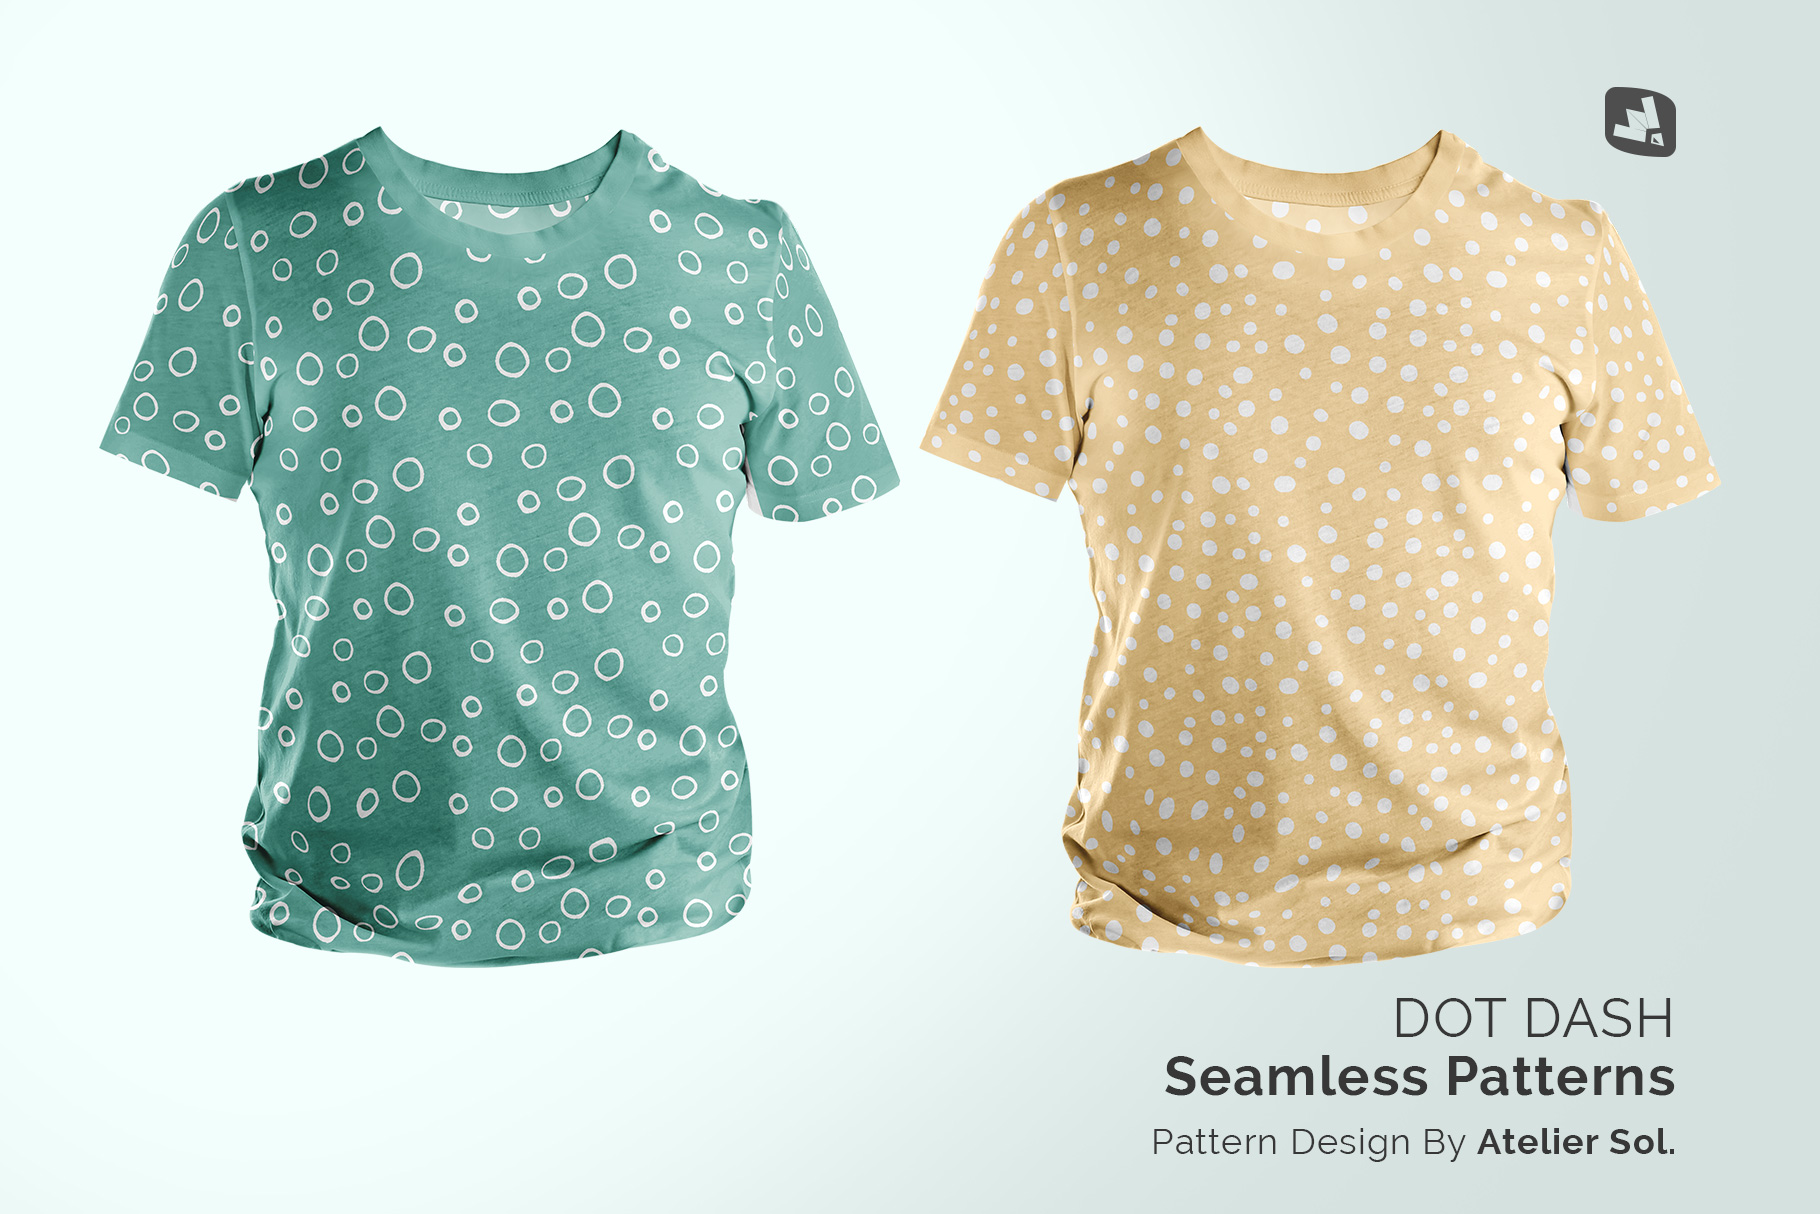 designer's credit of the men's round collar tshirt mockup